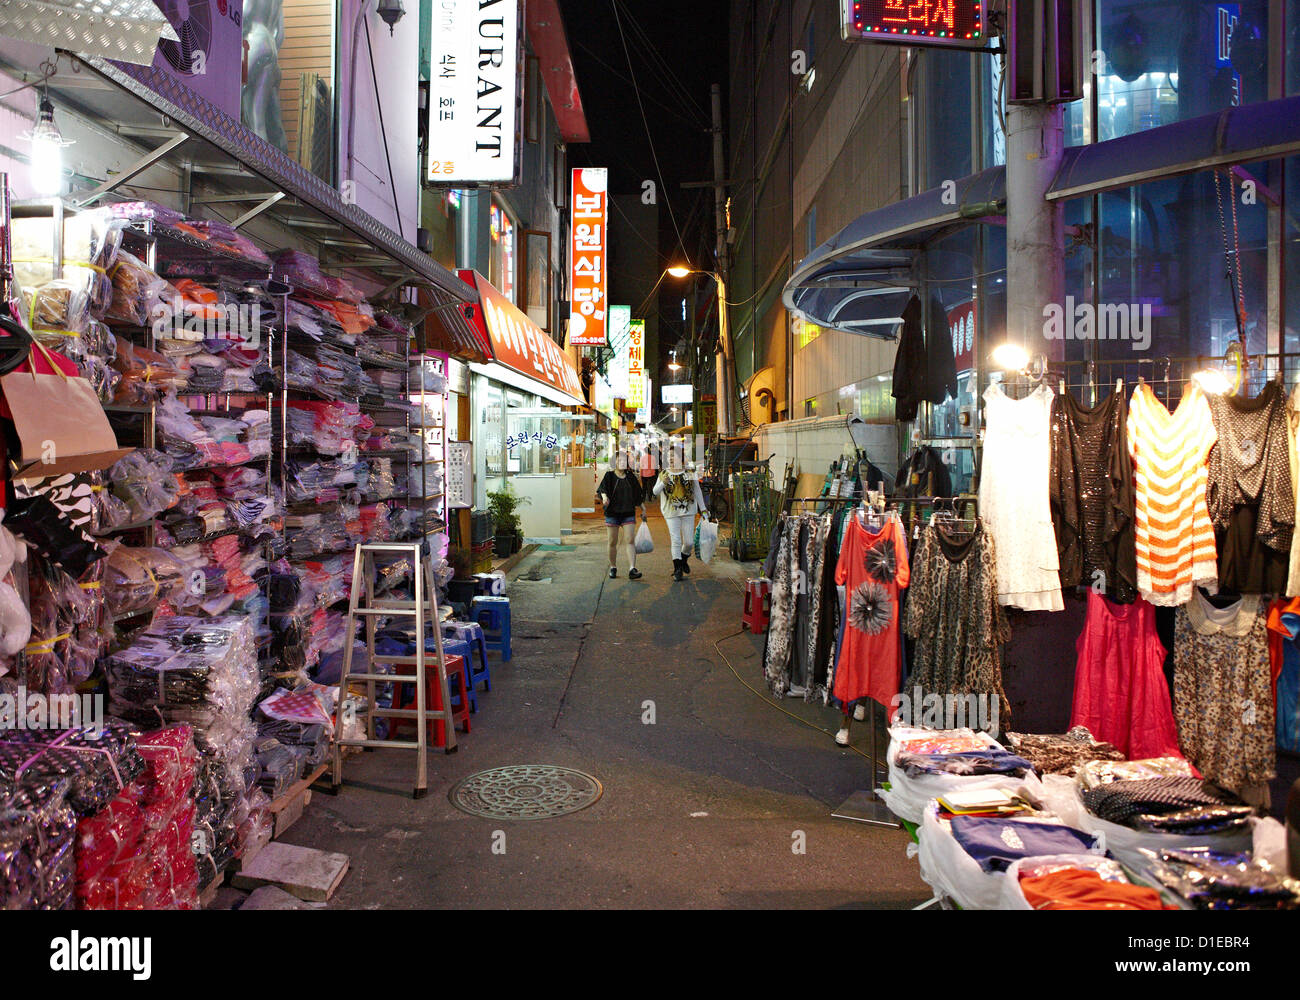 The Dongdaemun shopping district at night, Seoul, South Korea, Asia - Stock Image